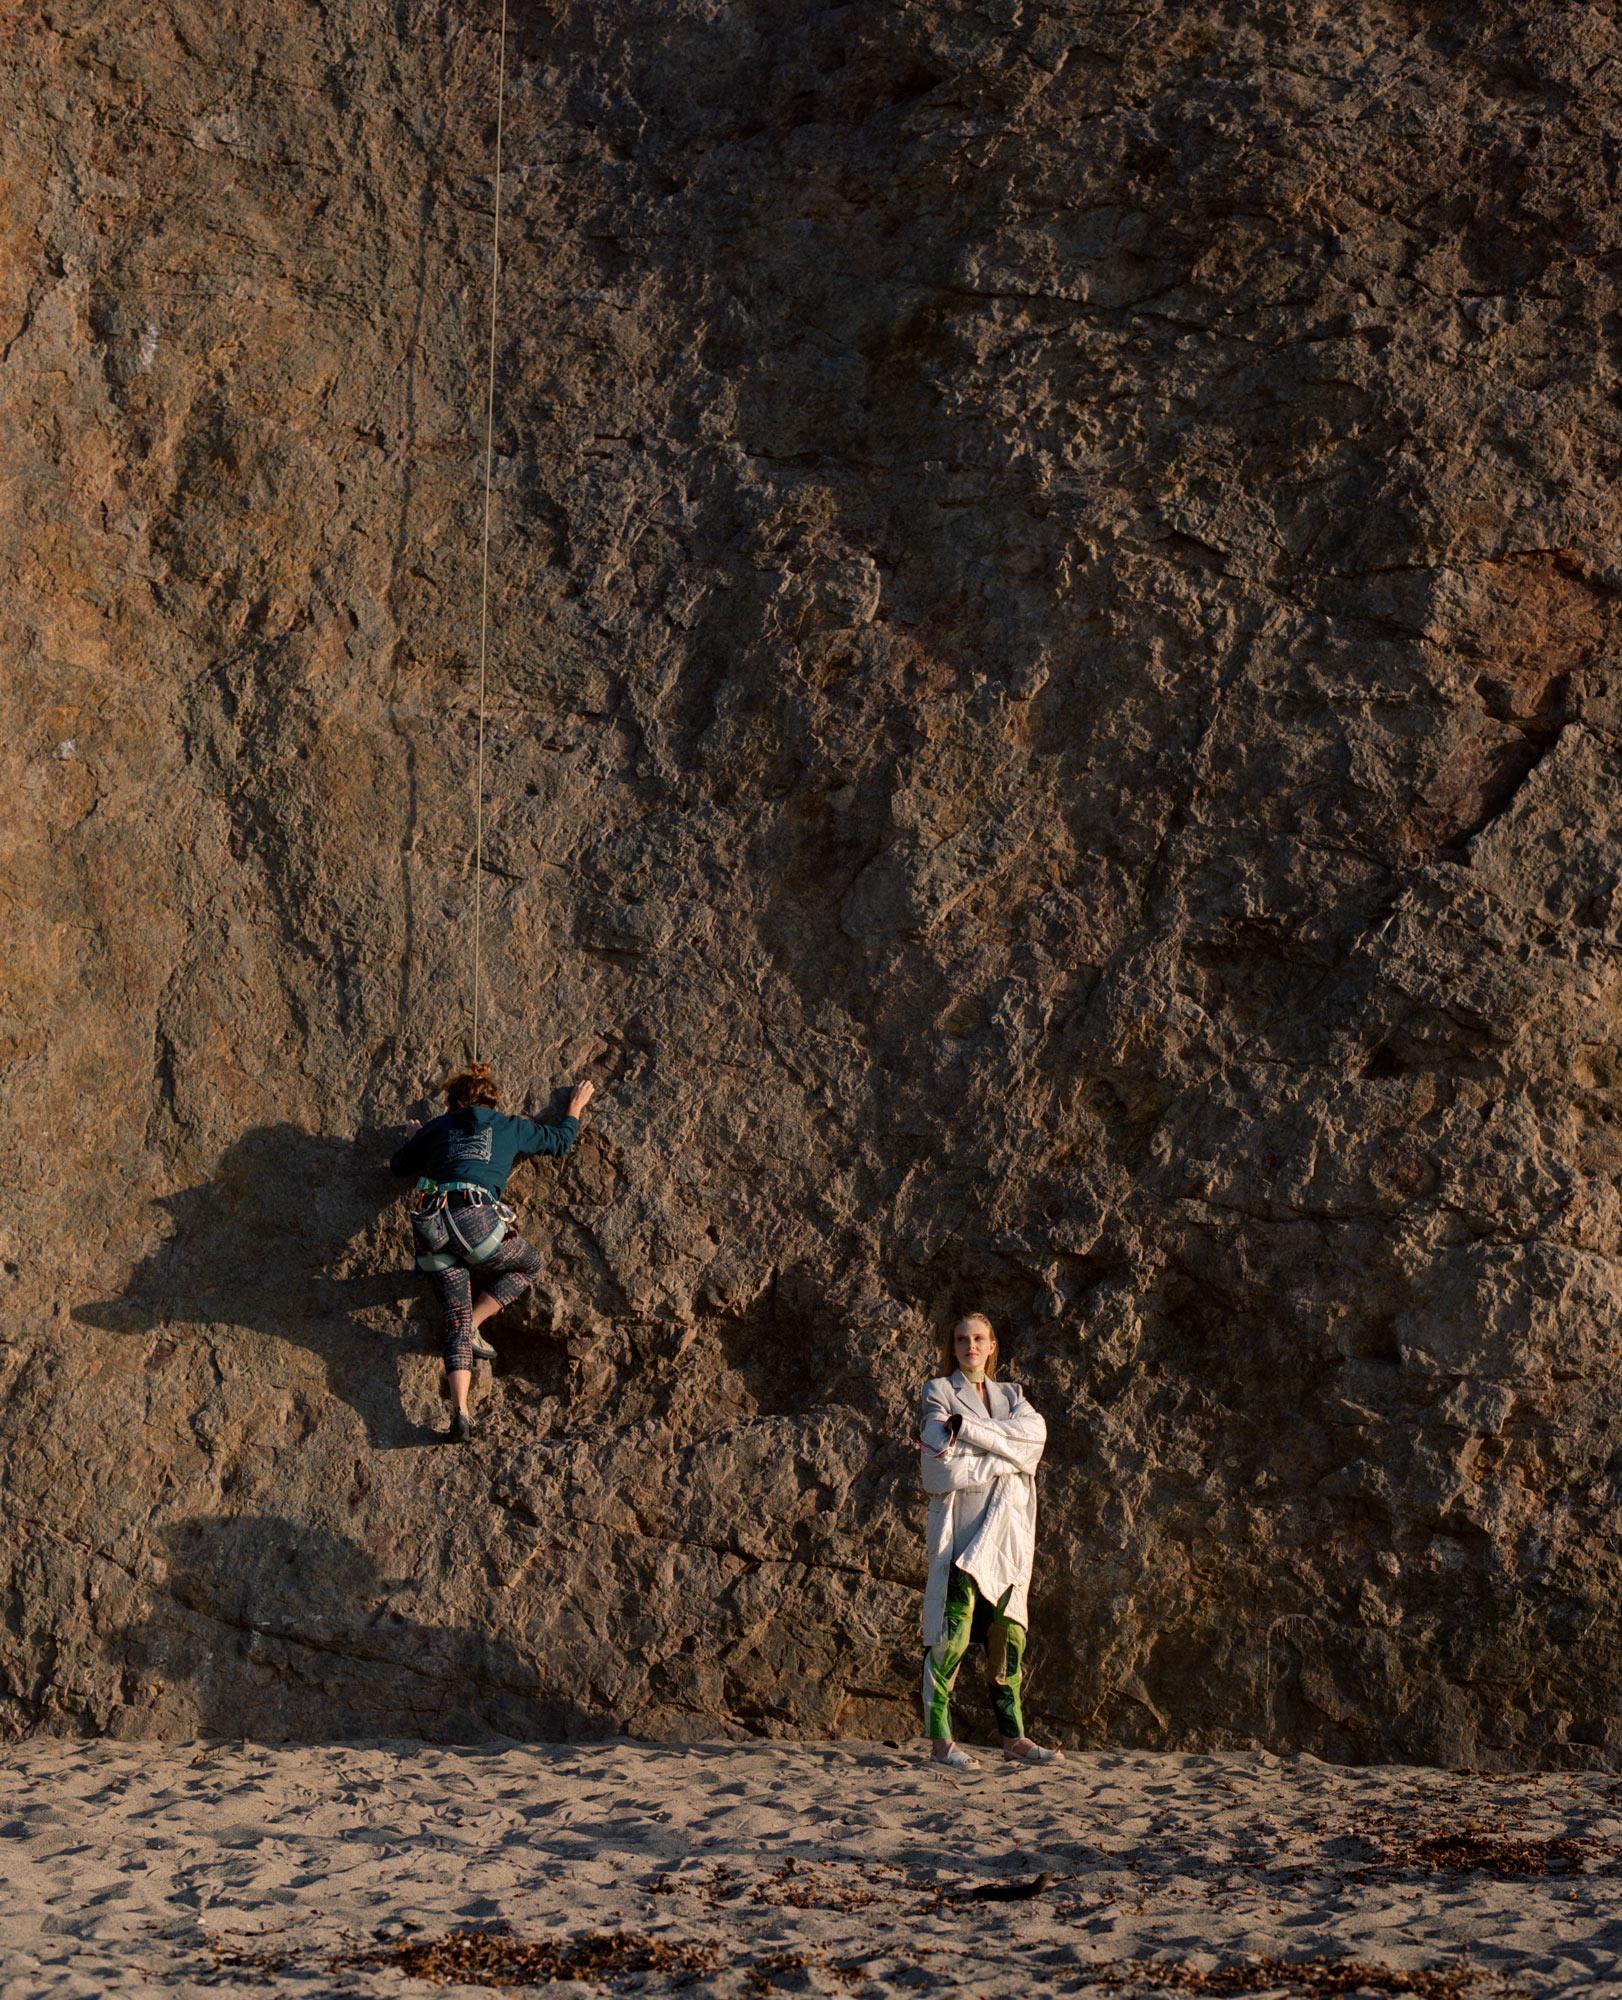 Cliff Valley, Point Dume, Malibu Beach, Editorial For LadyGunn Magazine, Featuring Piene Burgers, photography  by Ioannis Koussertari